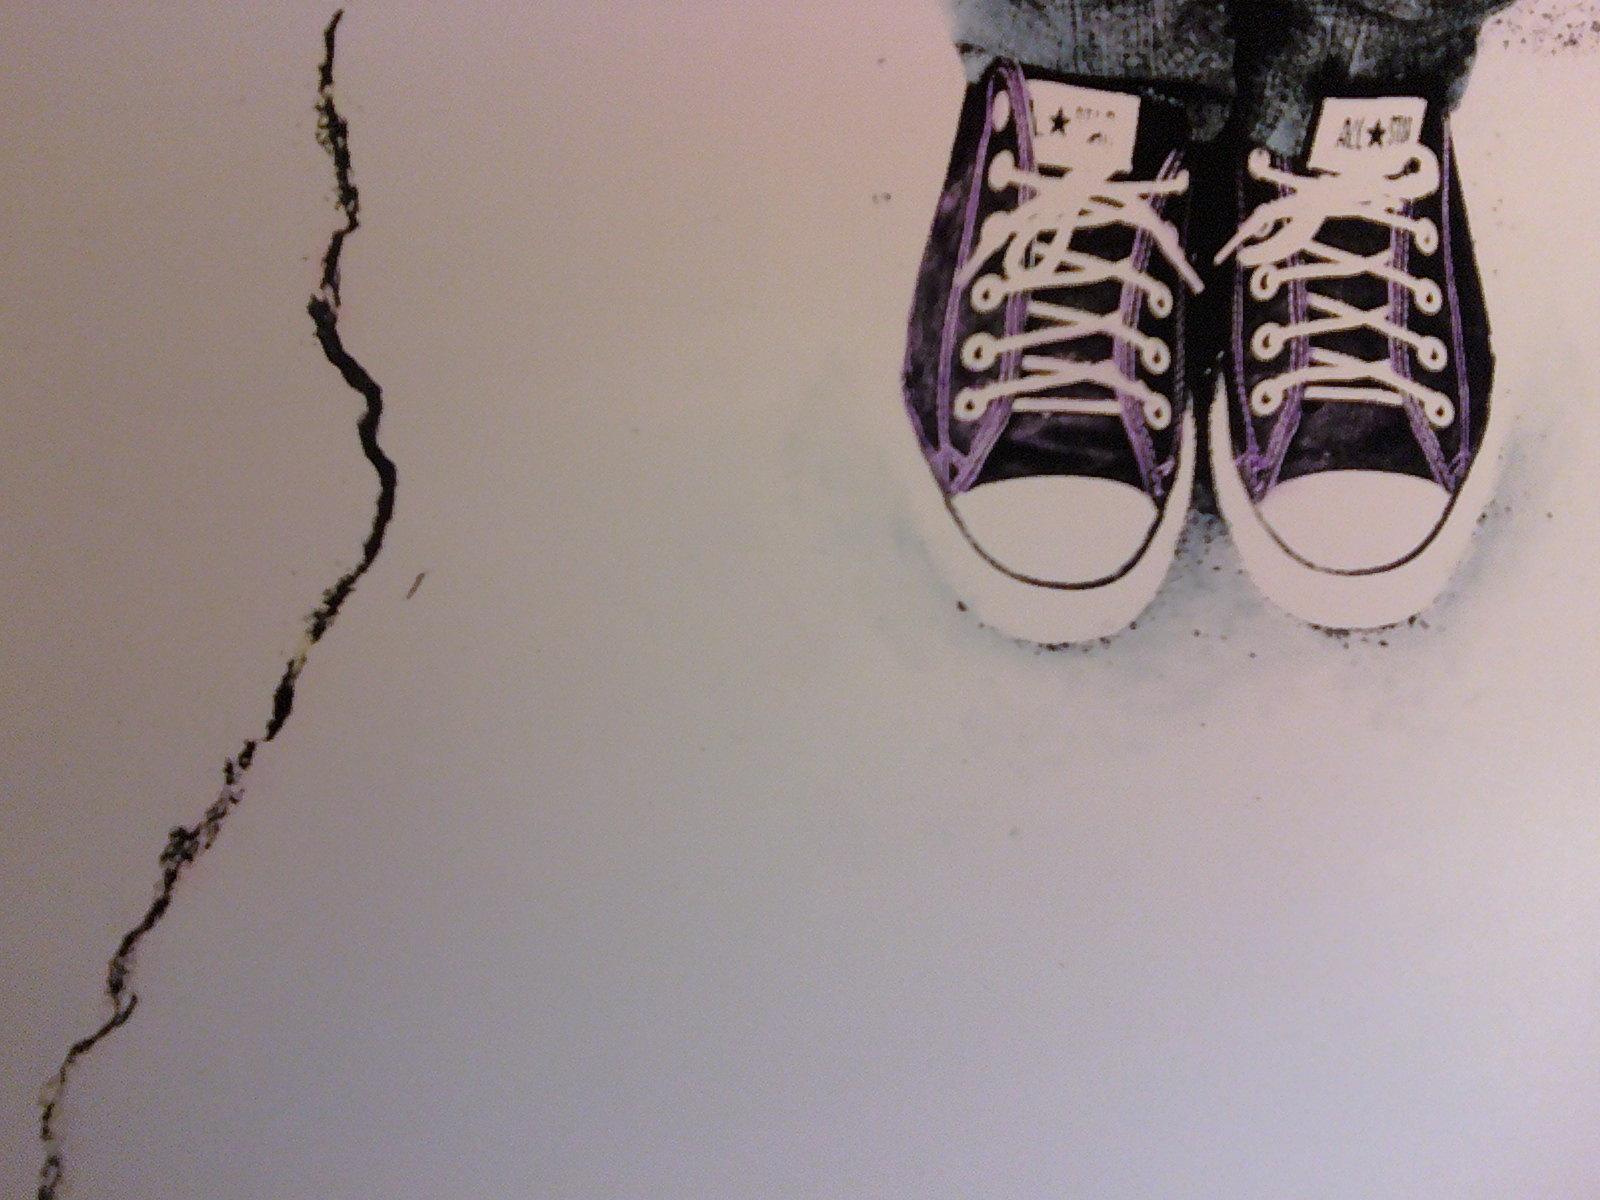 Cracked Pavement - ©Amanda Benincasa